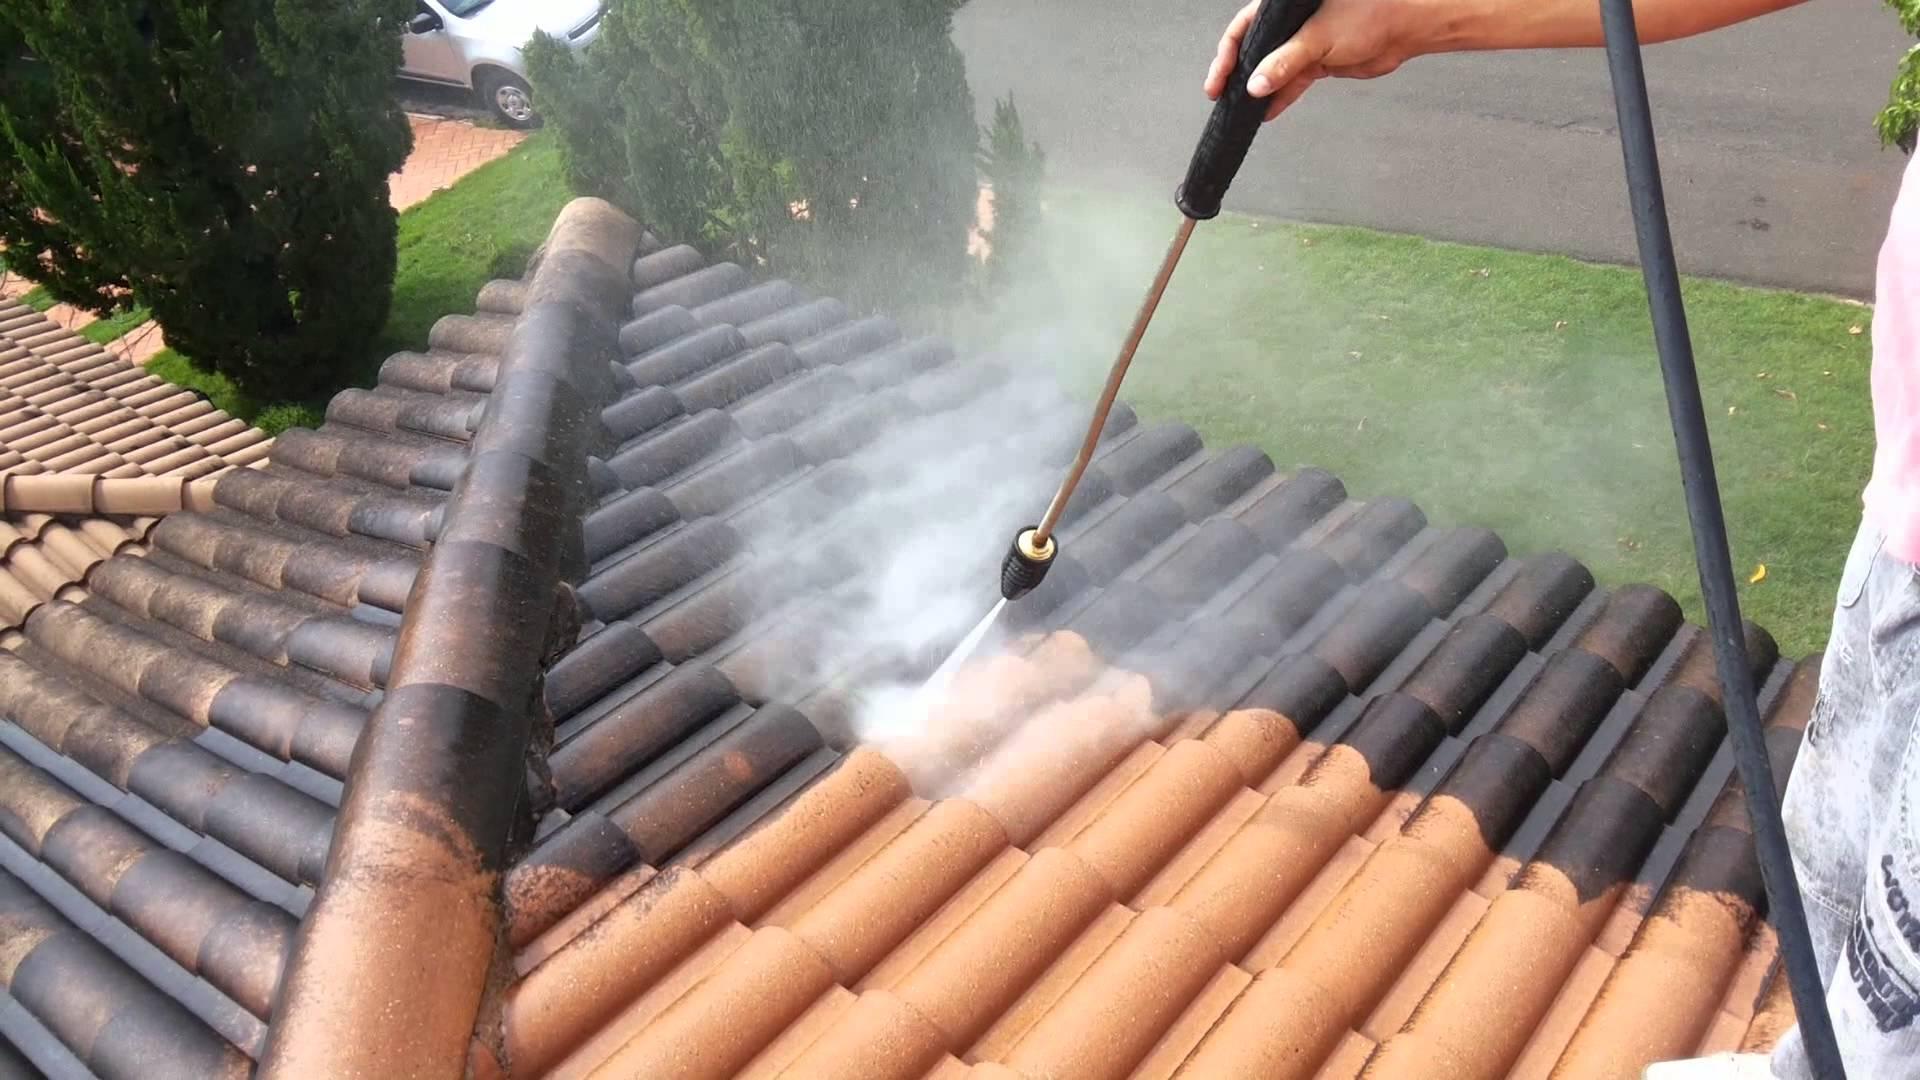 http://www.pierrevolschenk.co.za/wp-content/uploads/2016/04/Cleaning-of-Roofs_Pierre-Volschenk.jpg